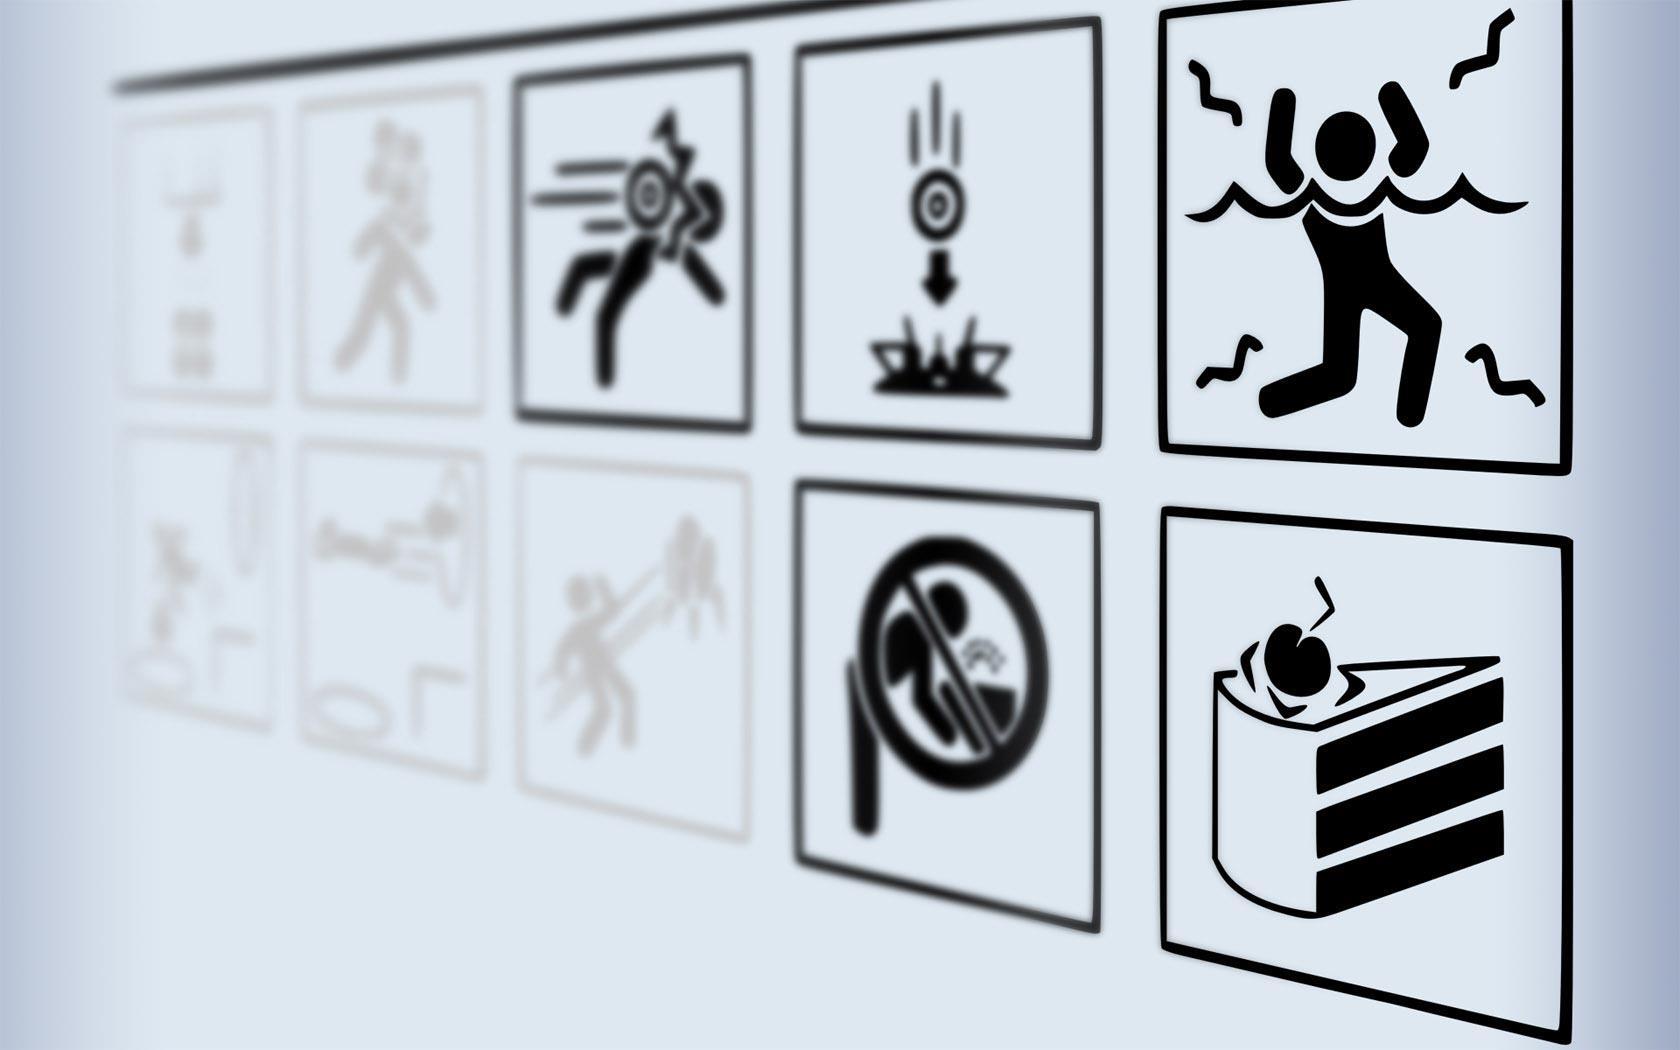 mur-de-symboles